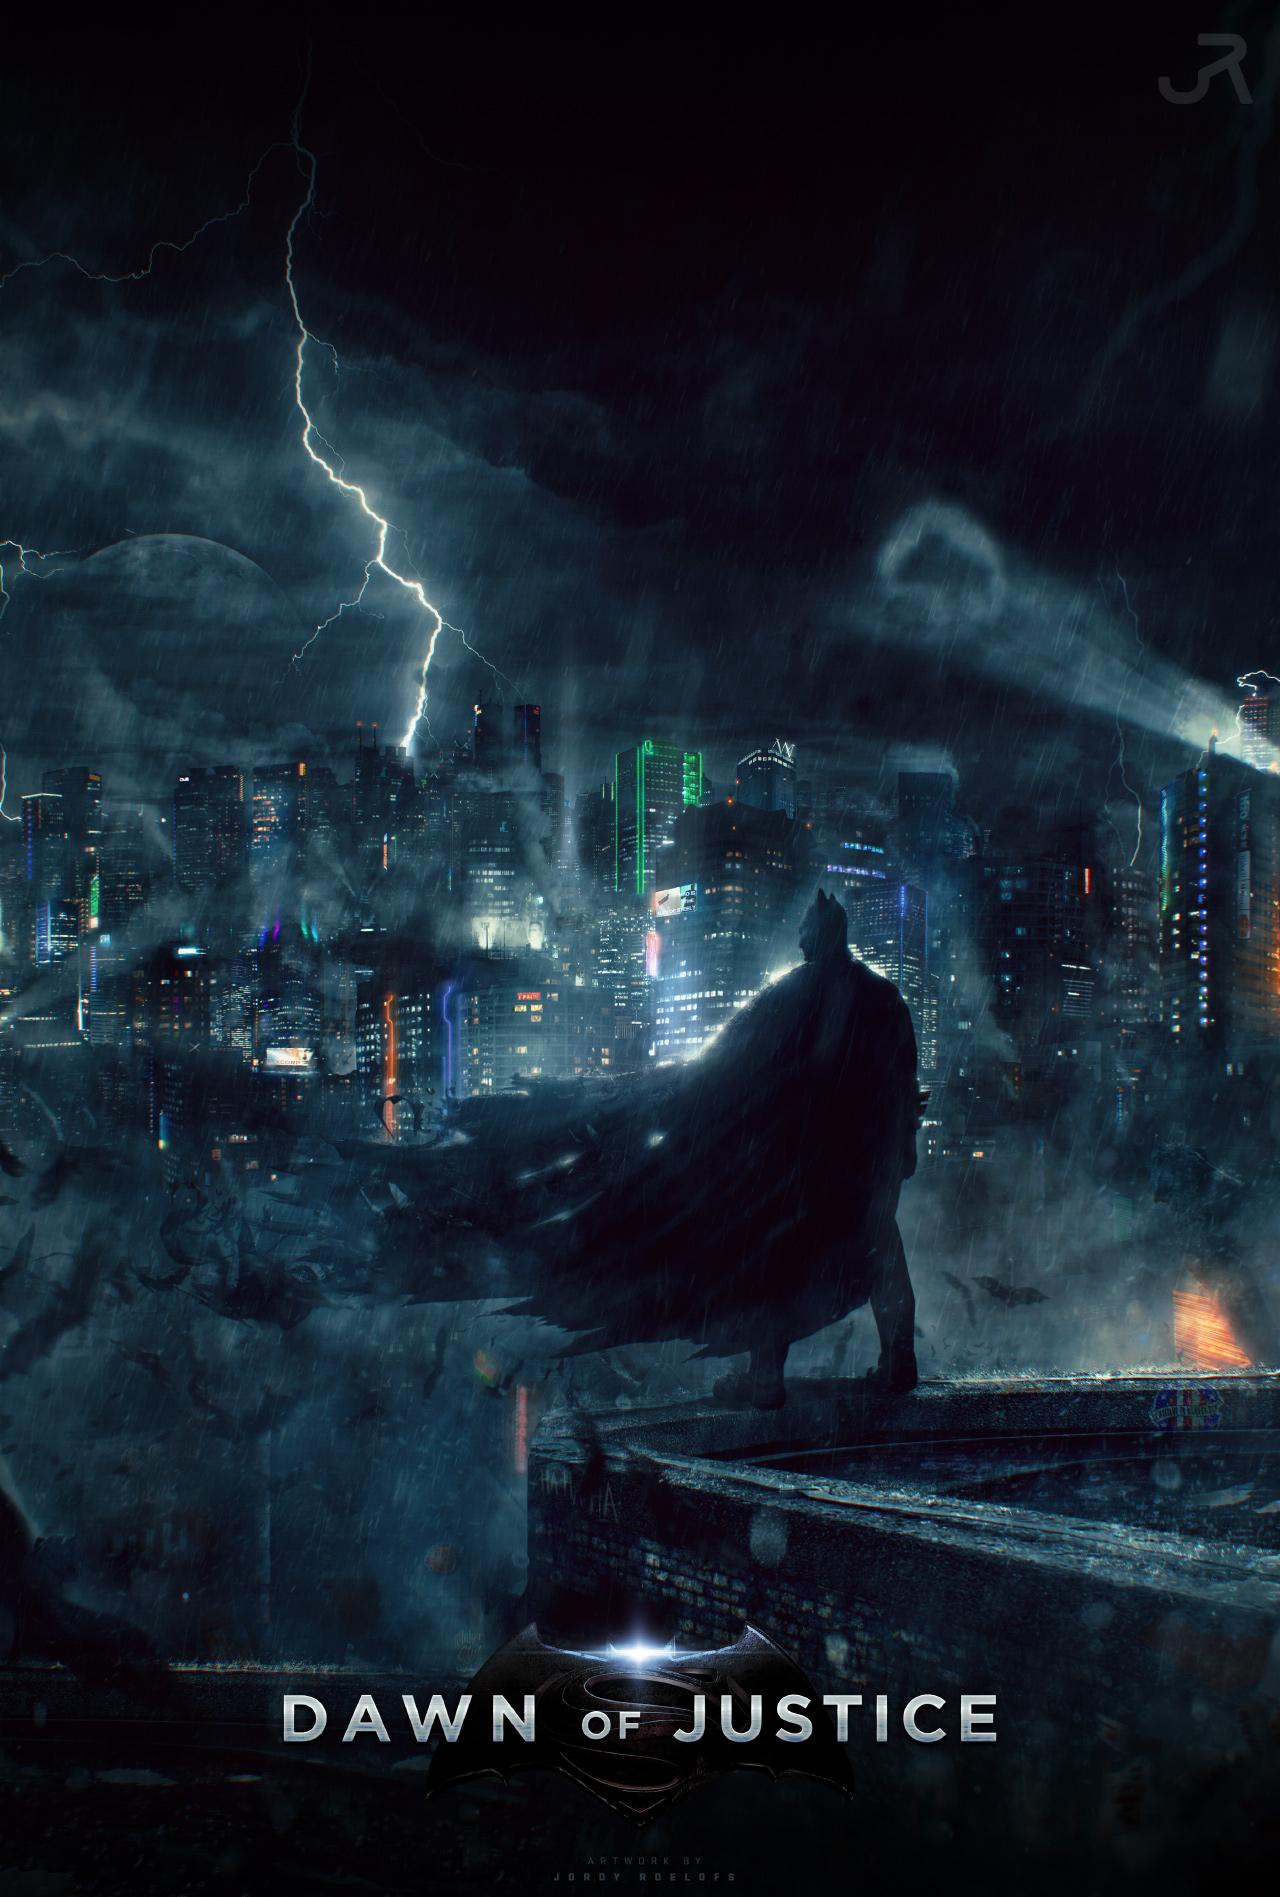 Batman V Superman Dawn Of Justice Poster 3 By Visuasys